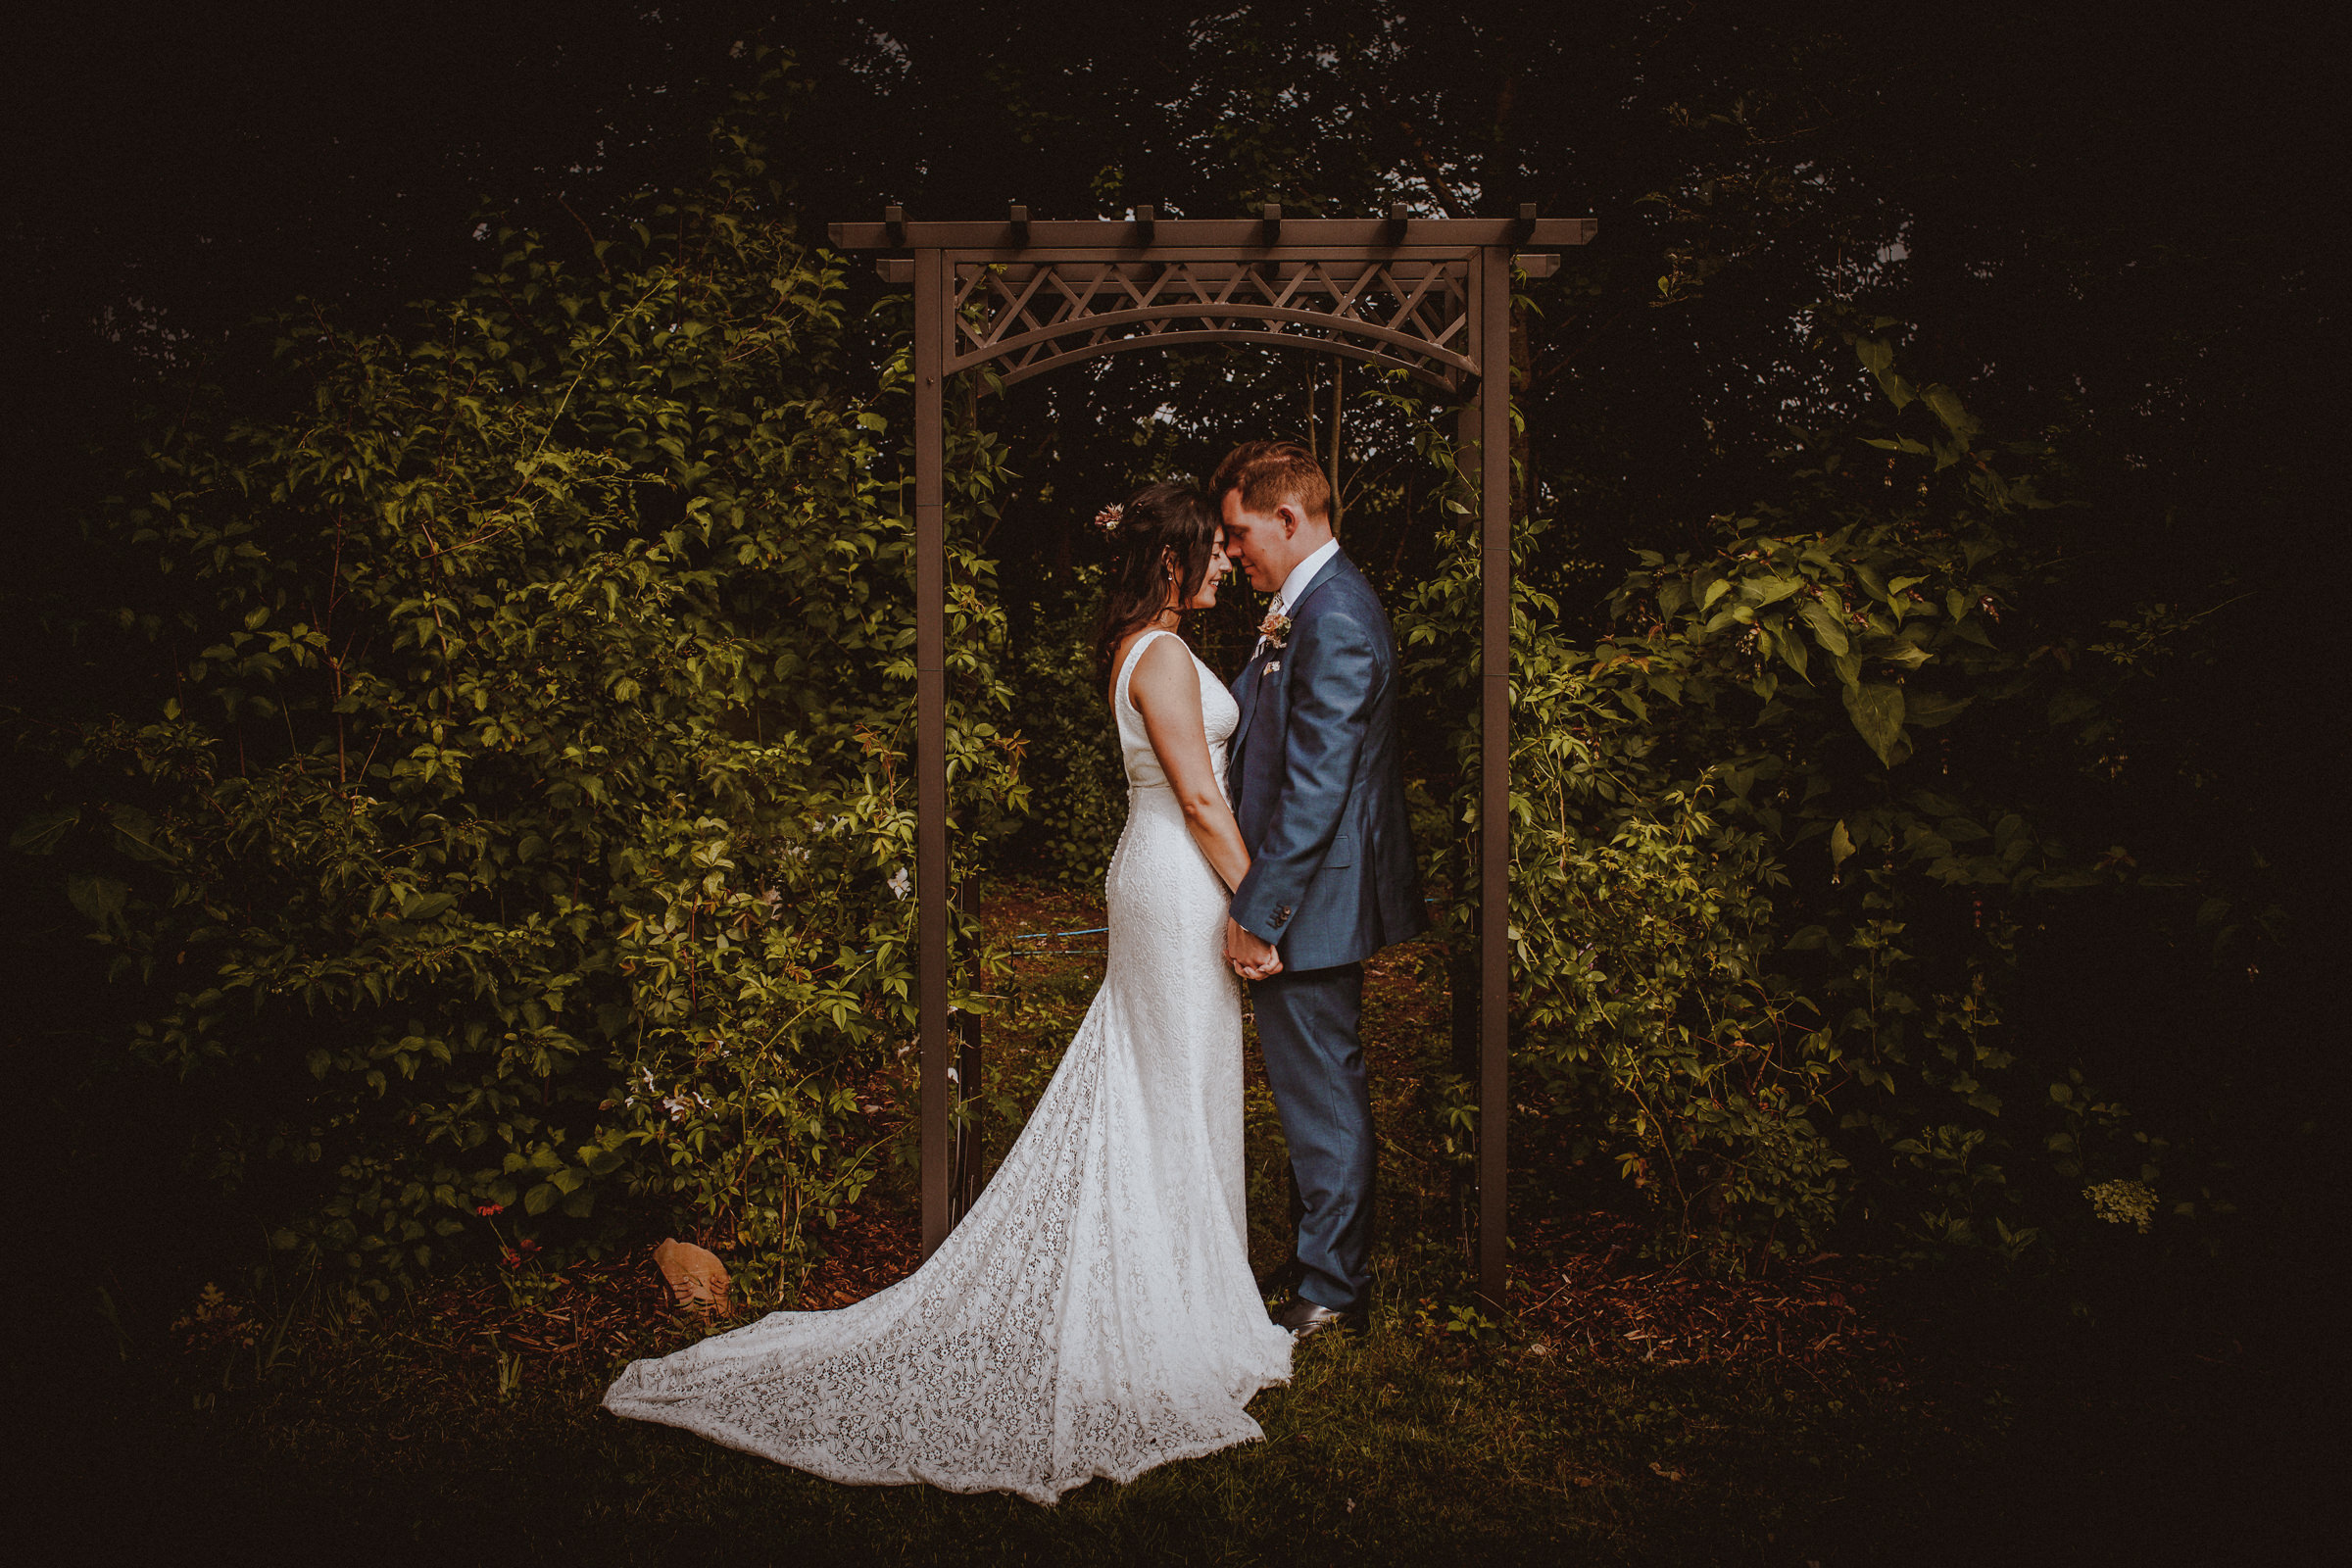 Face to face couple portrait under trellis - photo by Tomas Juskaitis Photography